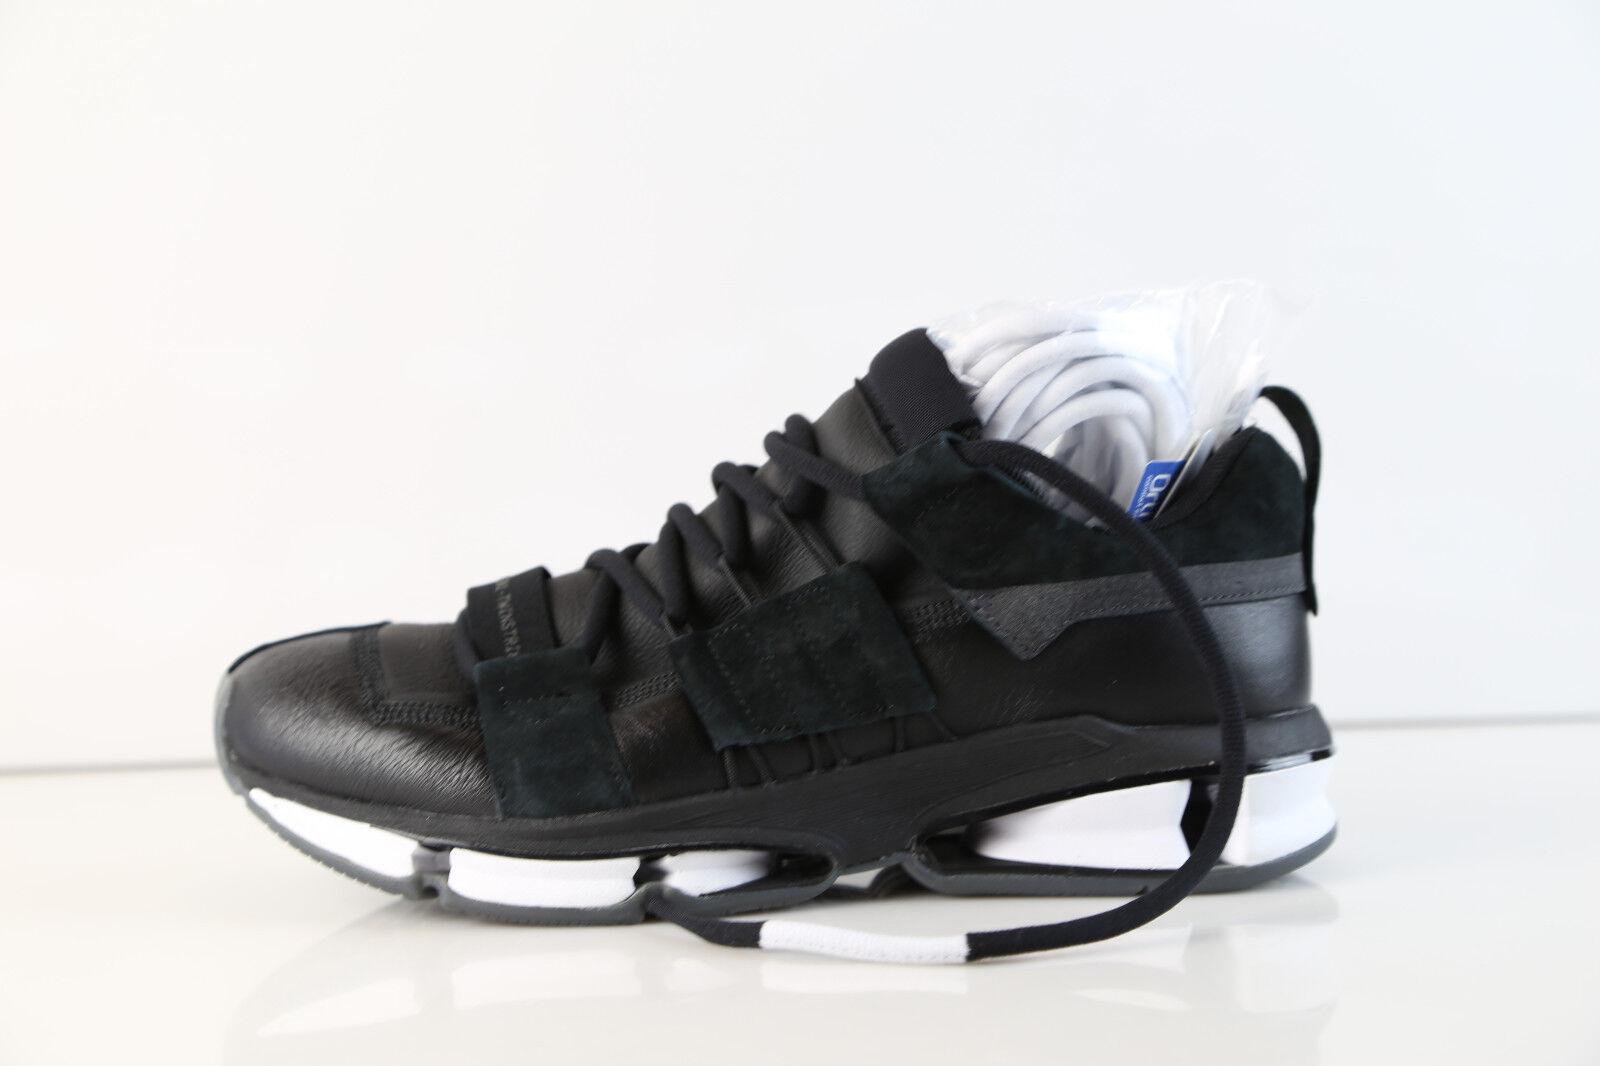 Adidas Twinstrike ADV Stretch Leather Core Black B28015 5-13 twin consotrium